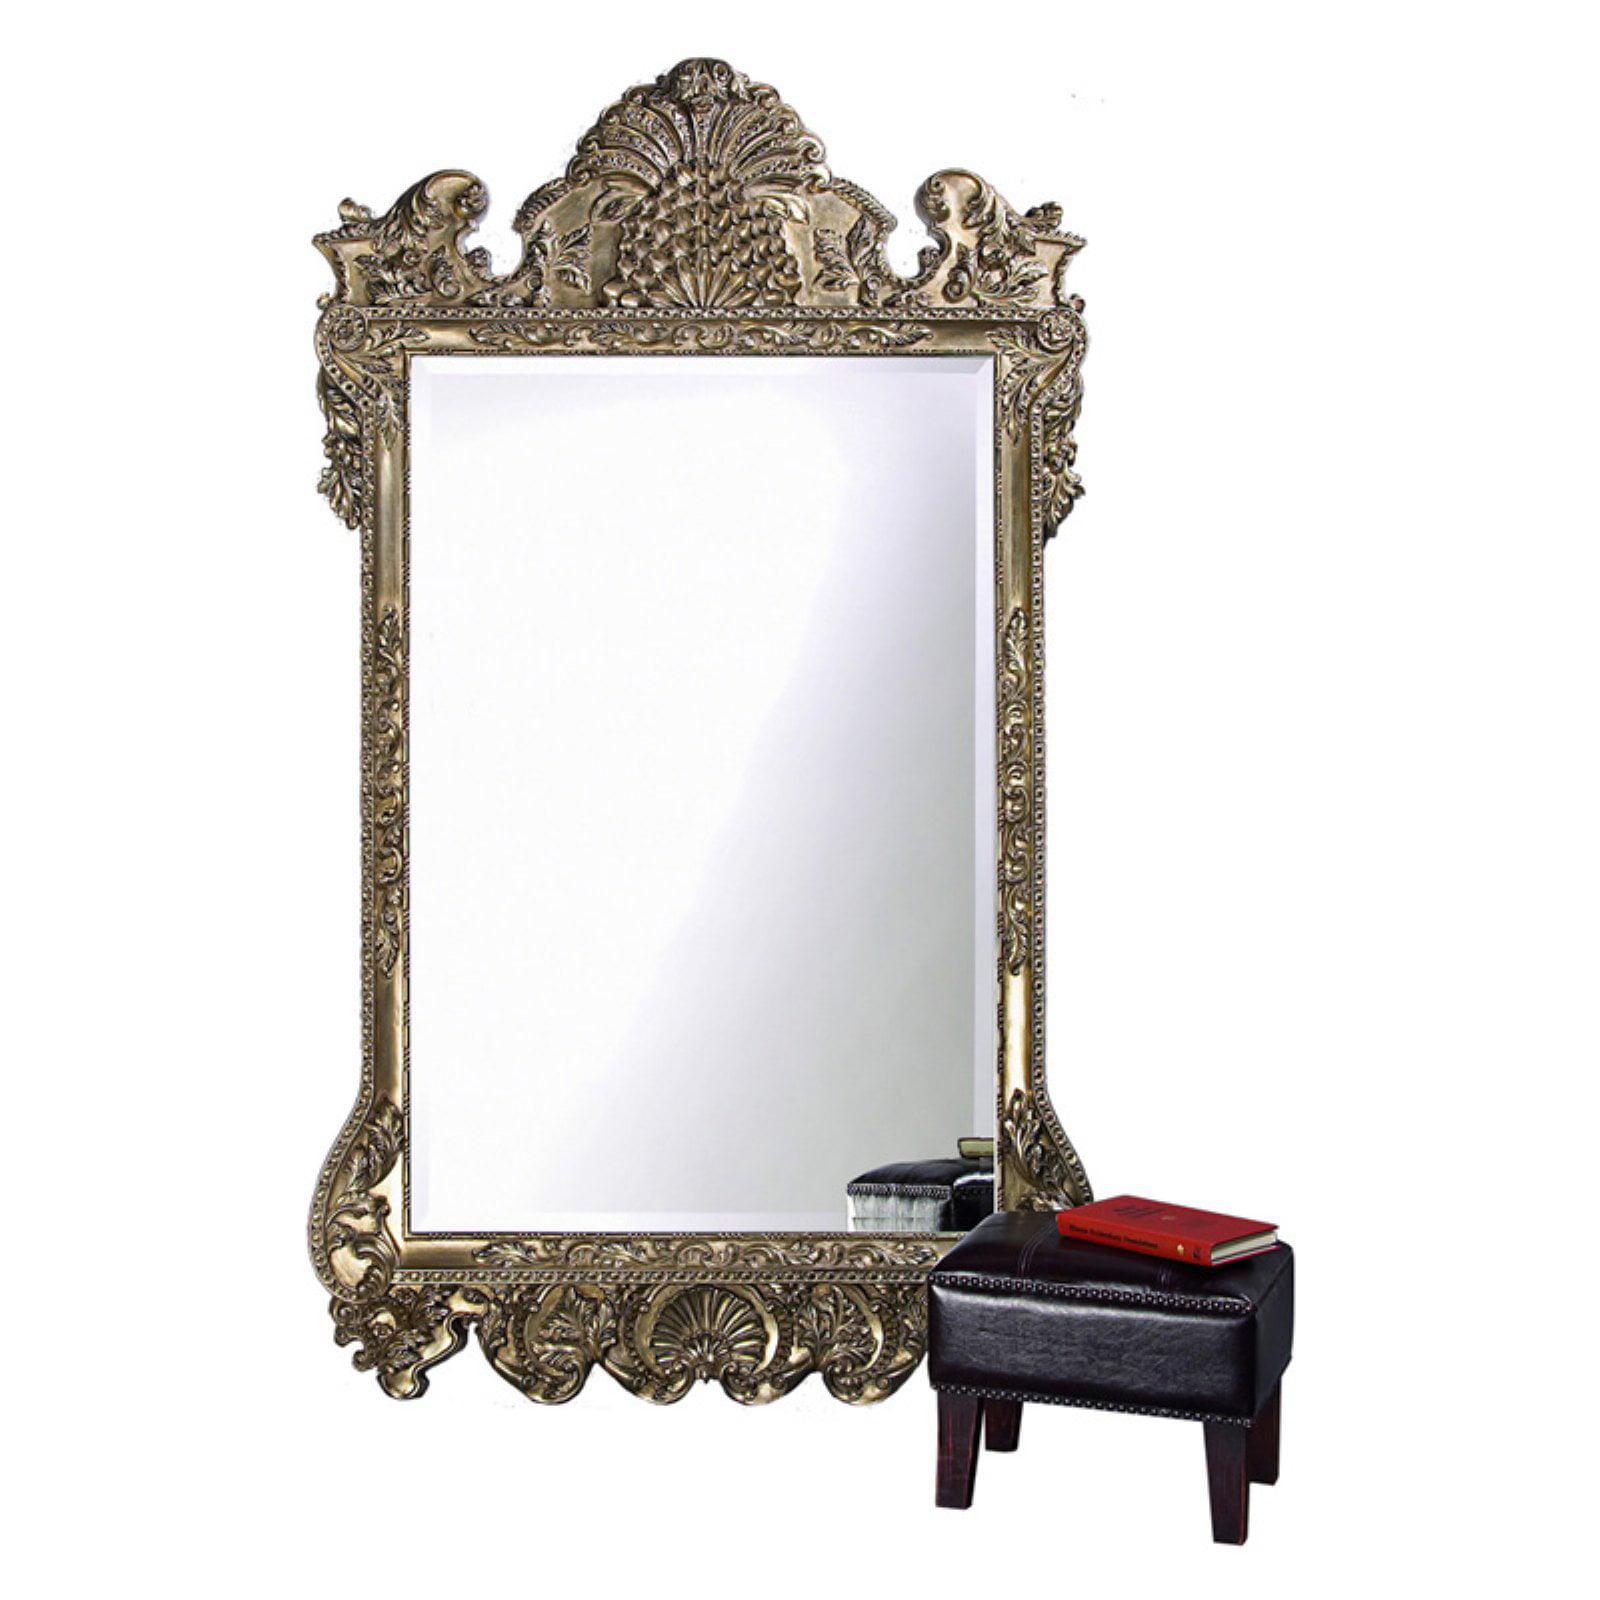 Howard Elliott Marquette Leaning Floor Mirror - 48W x 84H in.